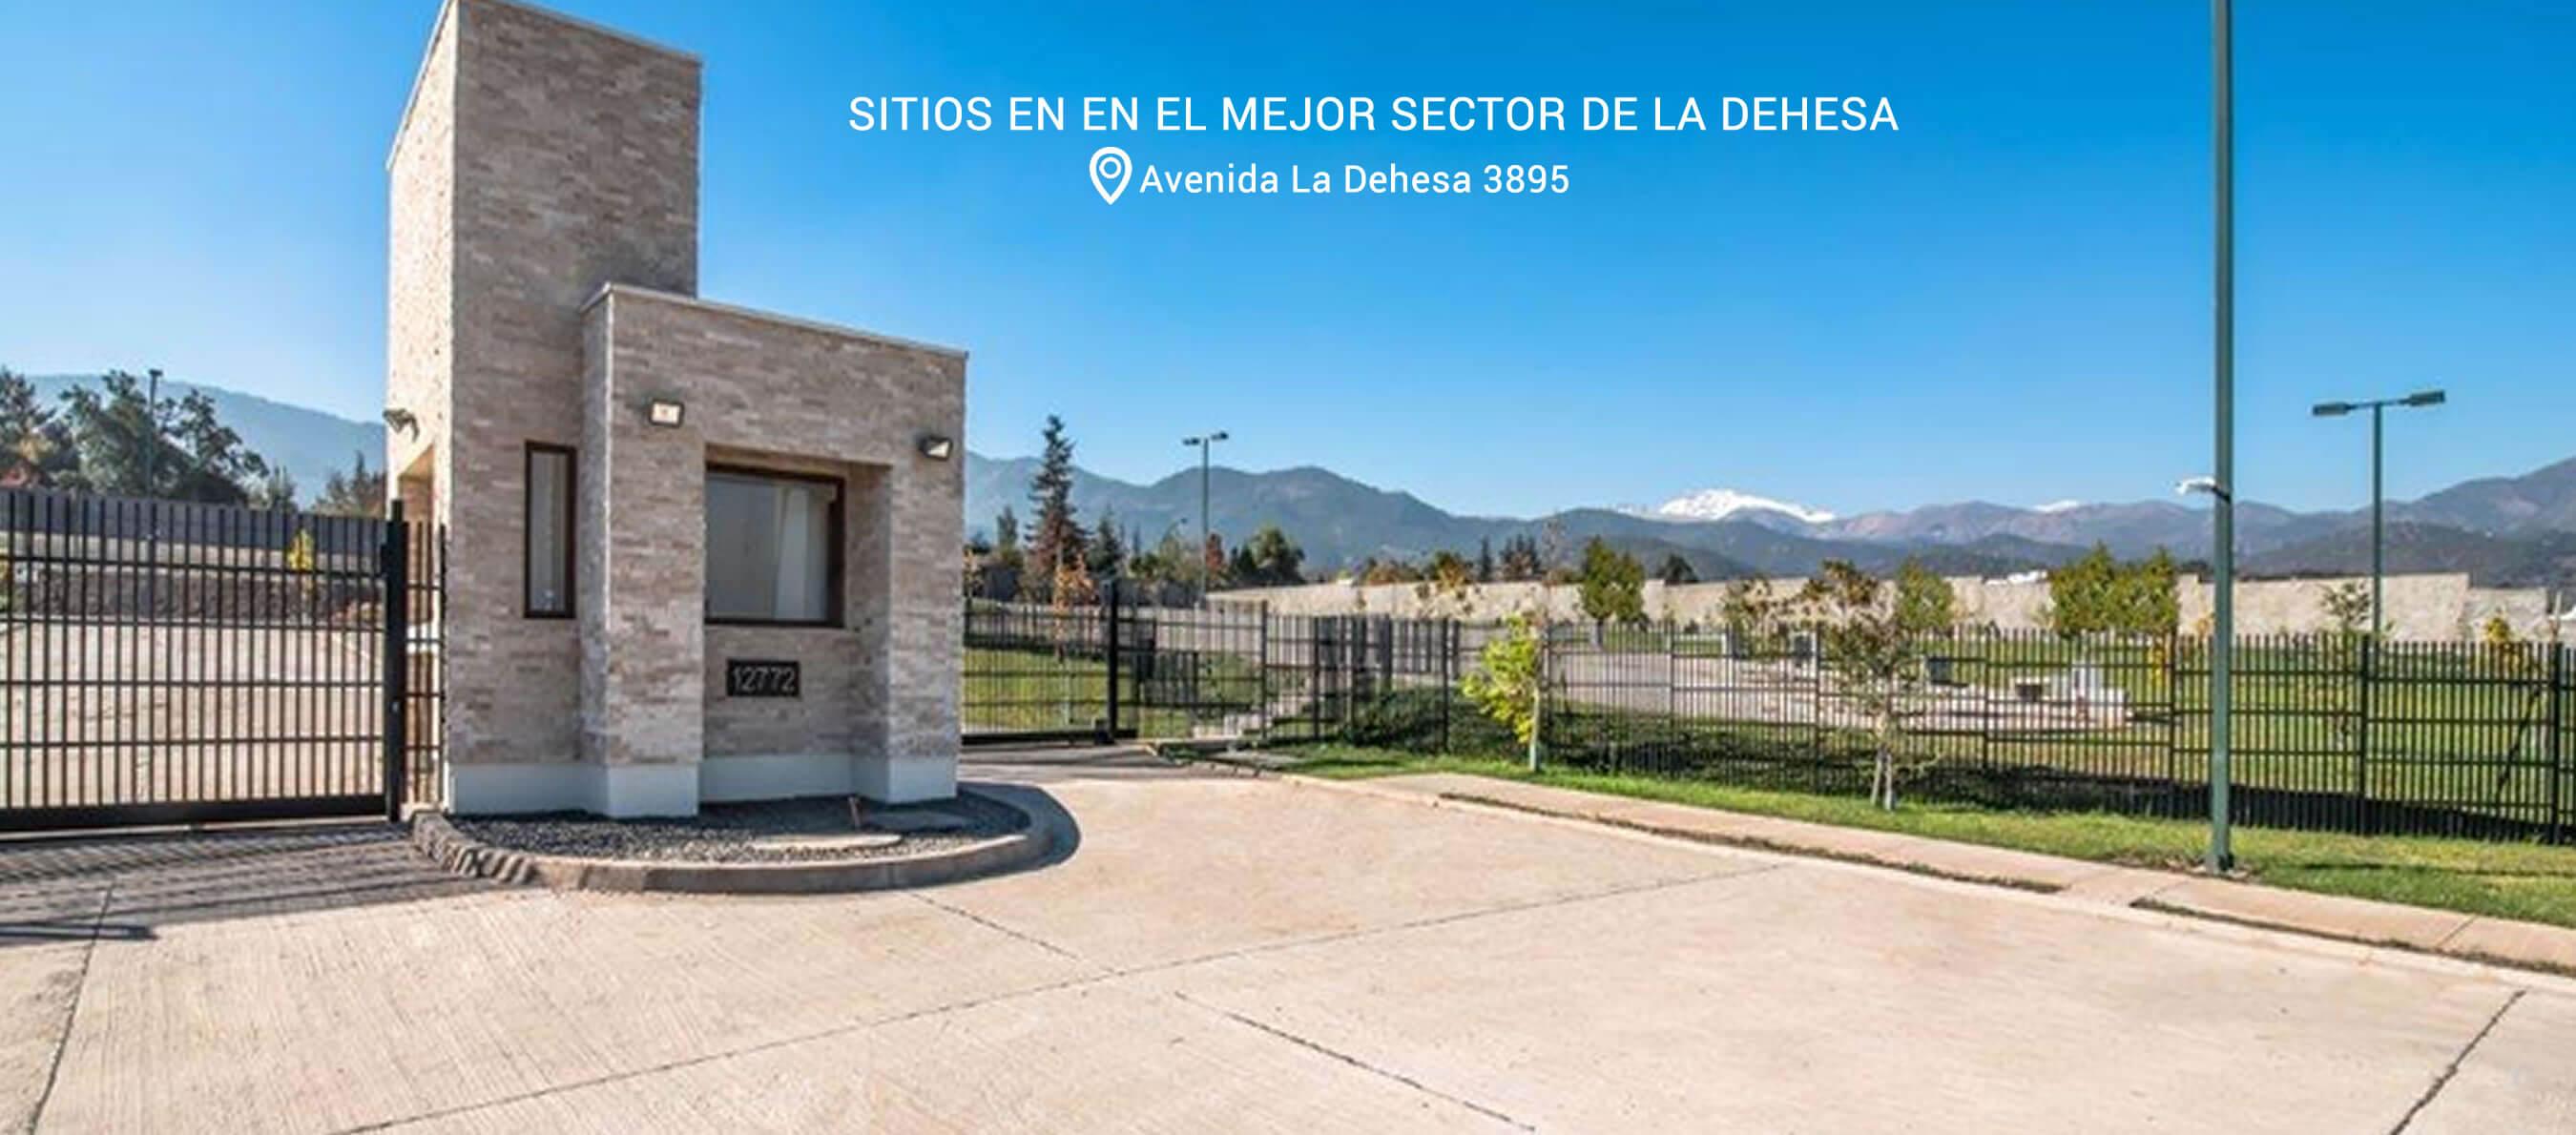 Loteo Quillayes de La Dehesa, La Dehesa